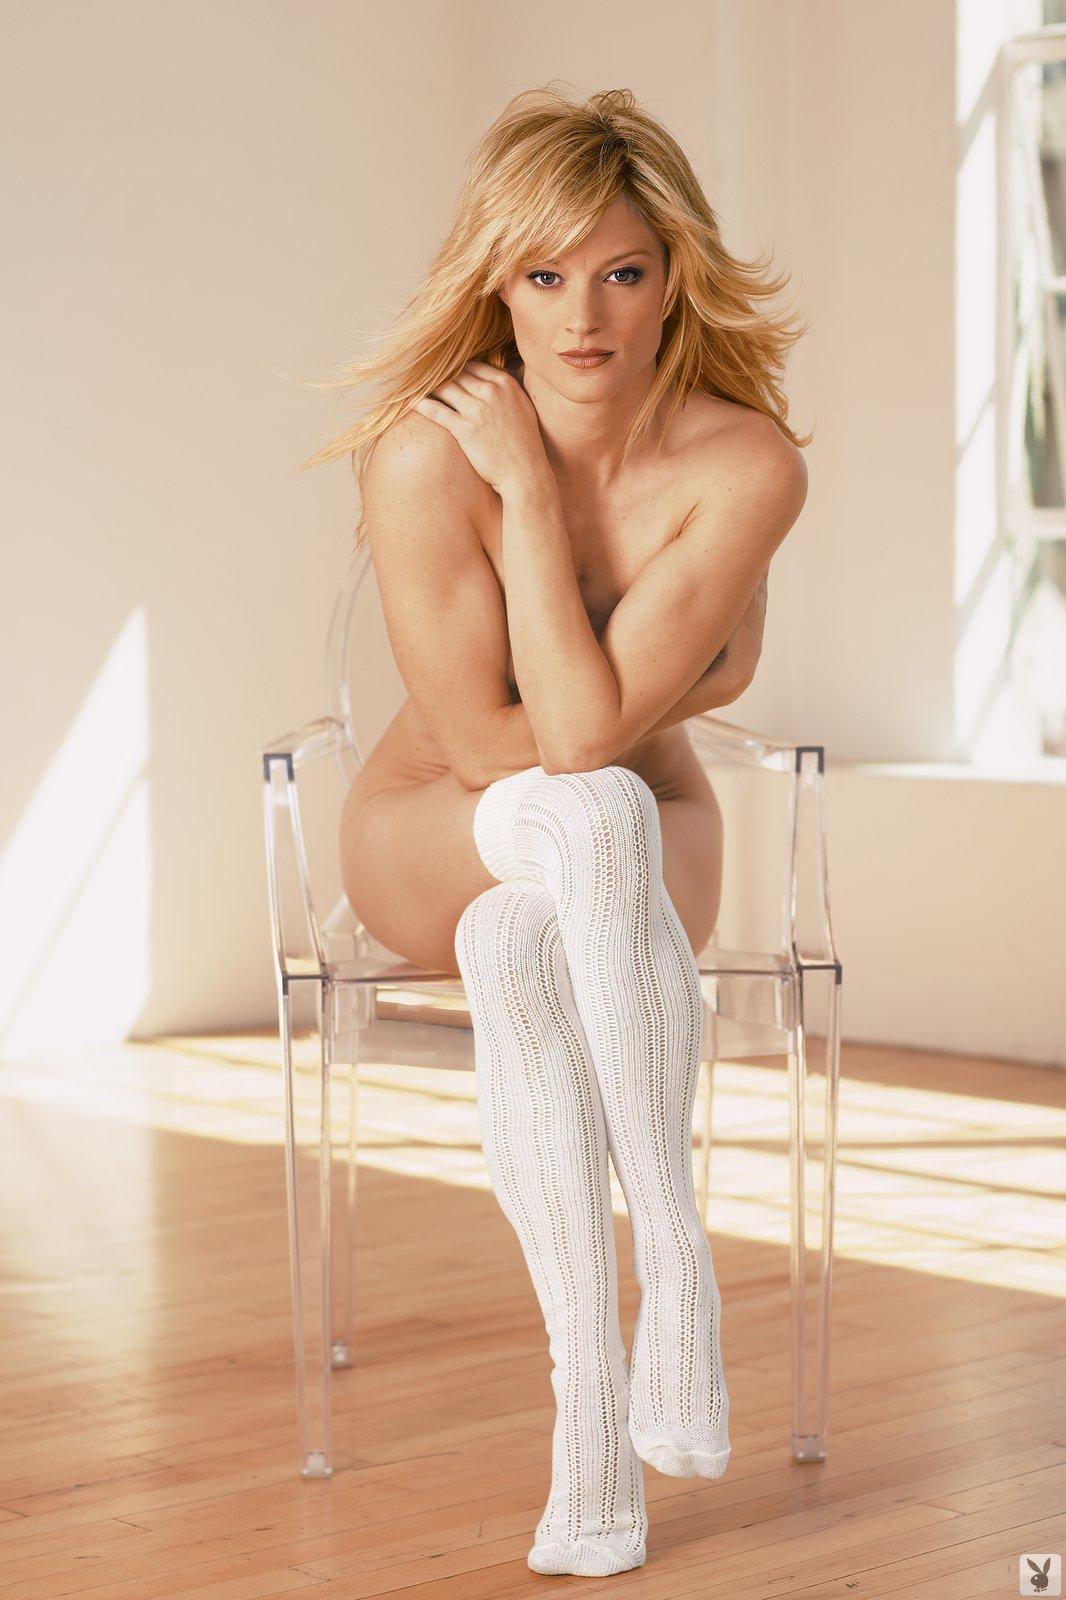 Teri Polo Nude On Playboy Plus! (2)